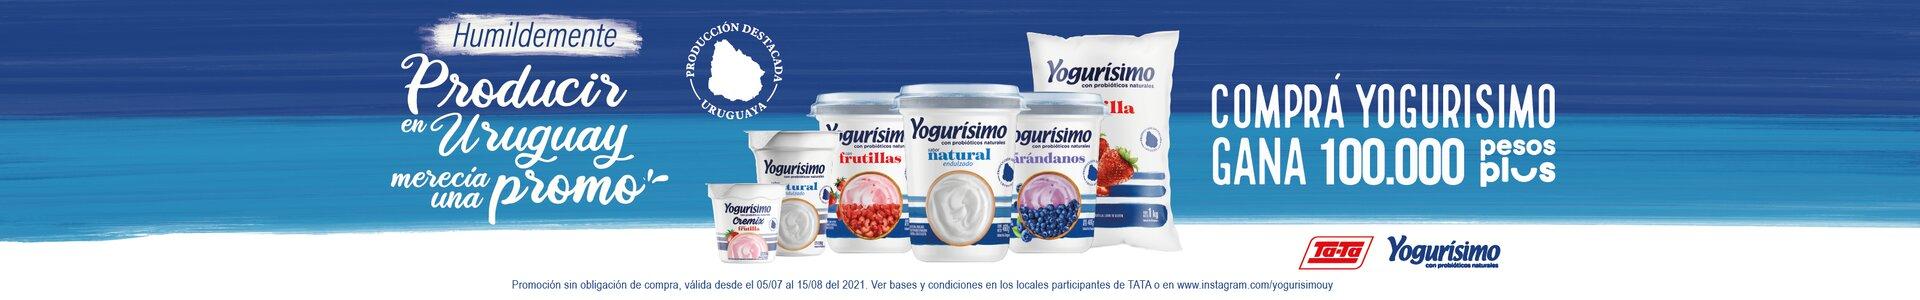 Promo Yogurisimo